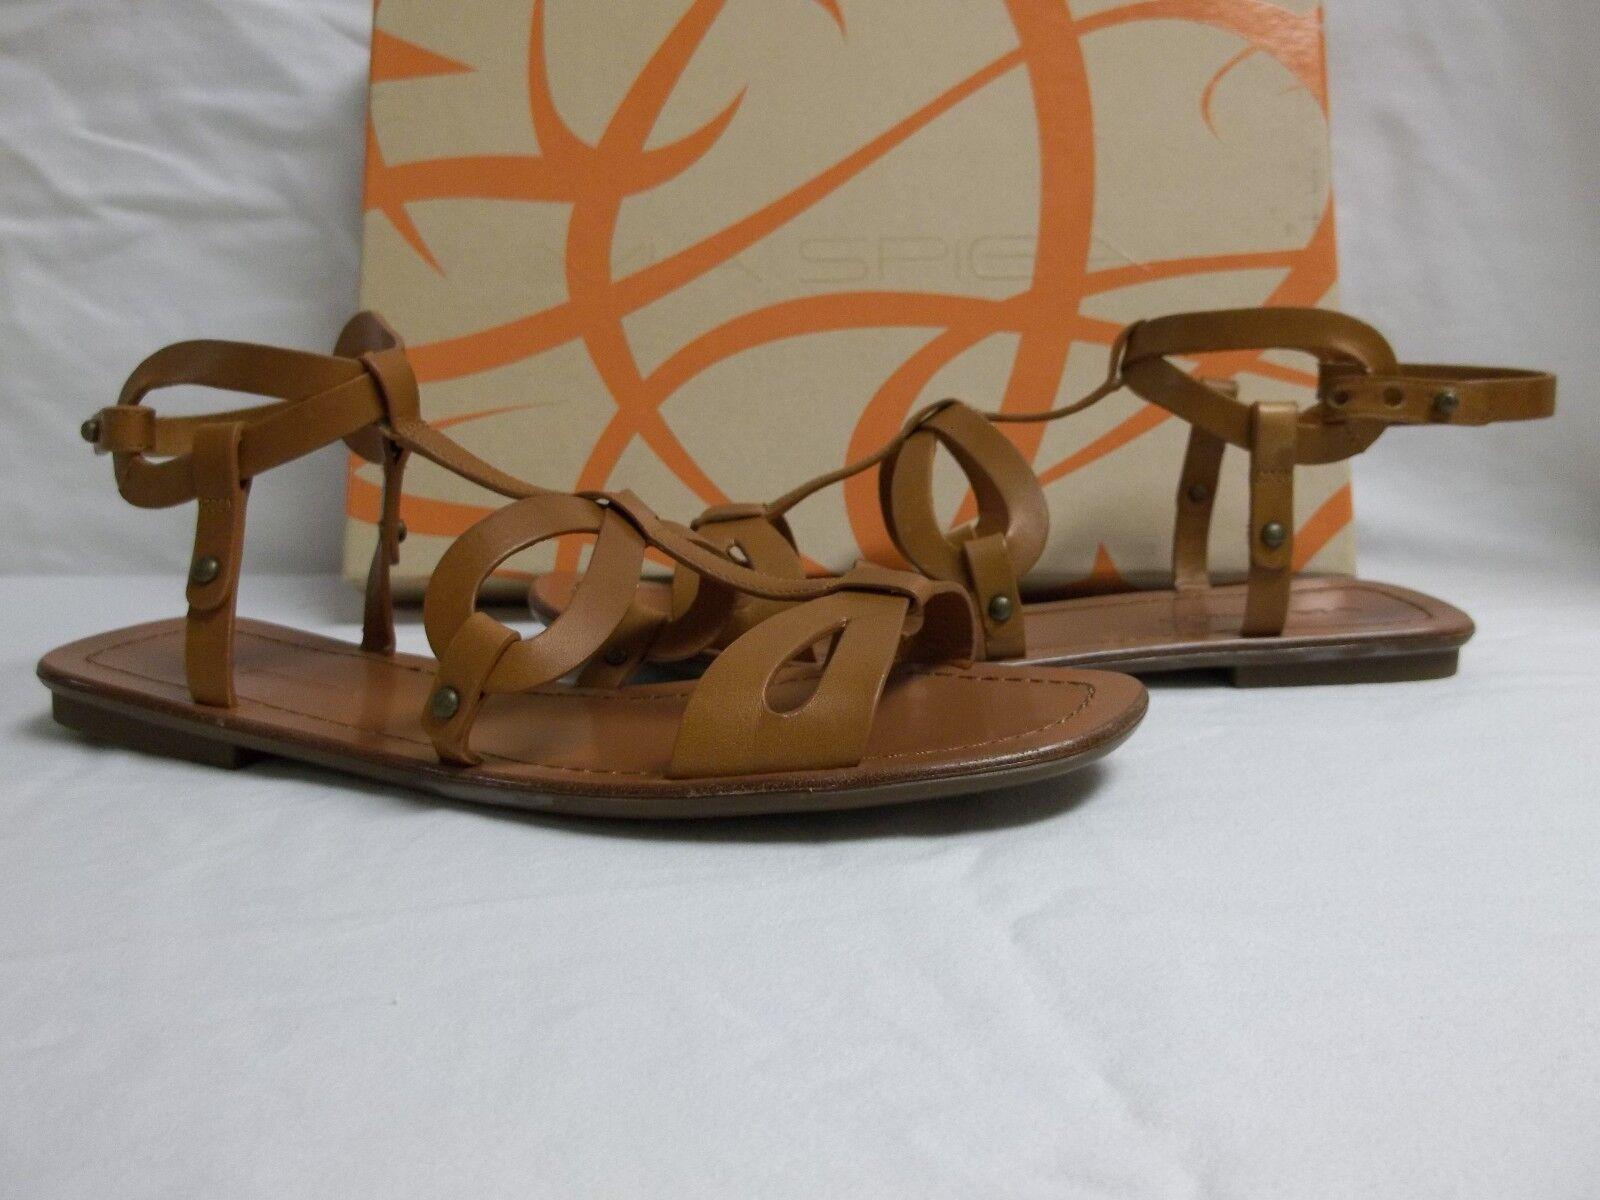 Via Spiga Größe 8 M Donnie Tan Leder Gladiator Sandales NEU Damenschuhe Schuhes